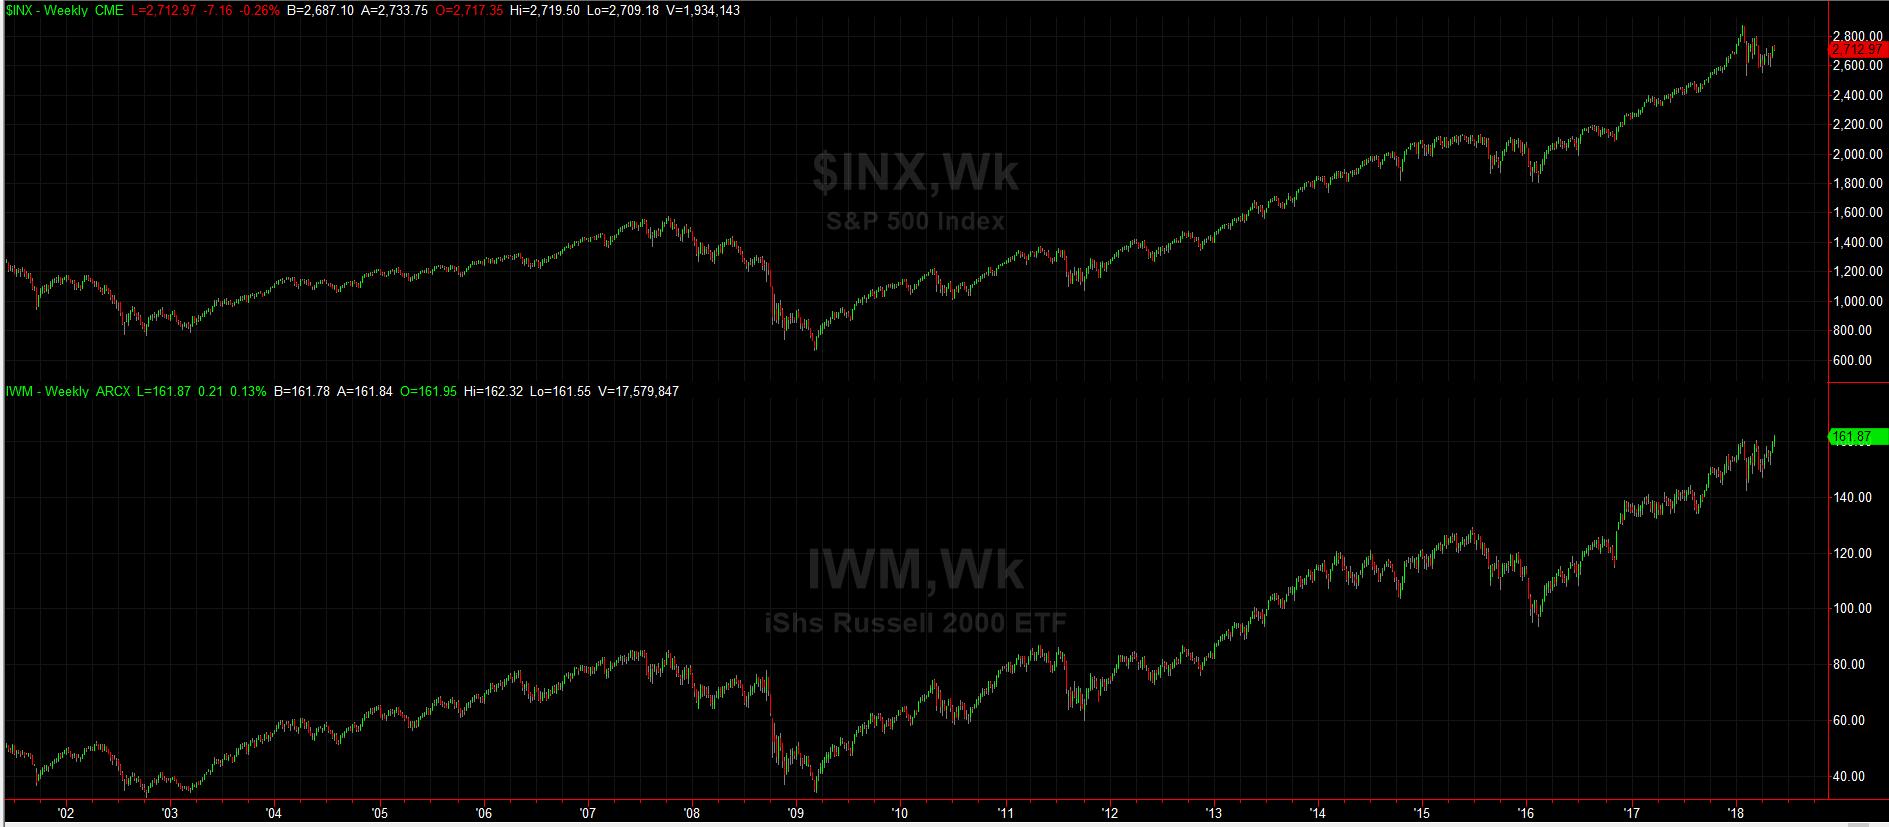 S&P 500 vs. IWM